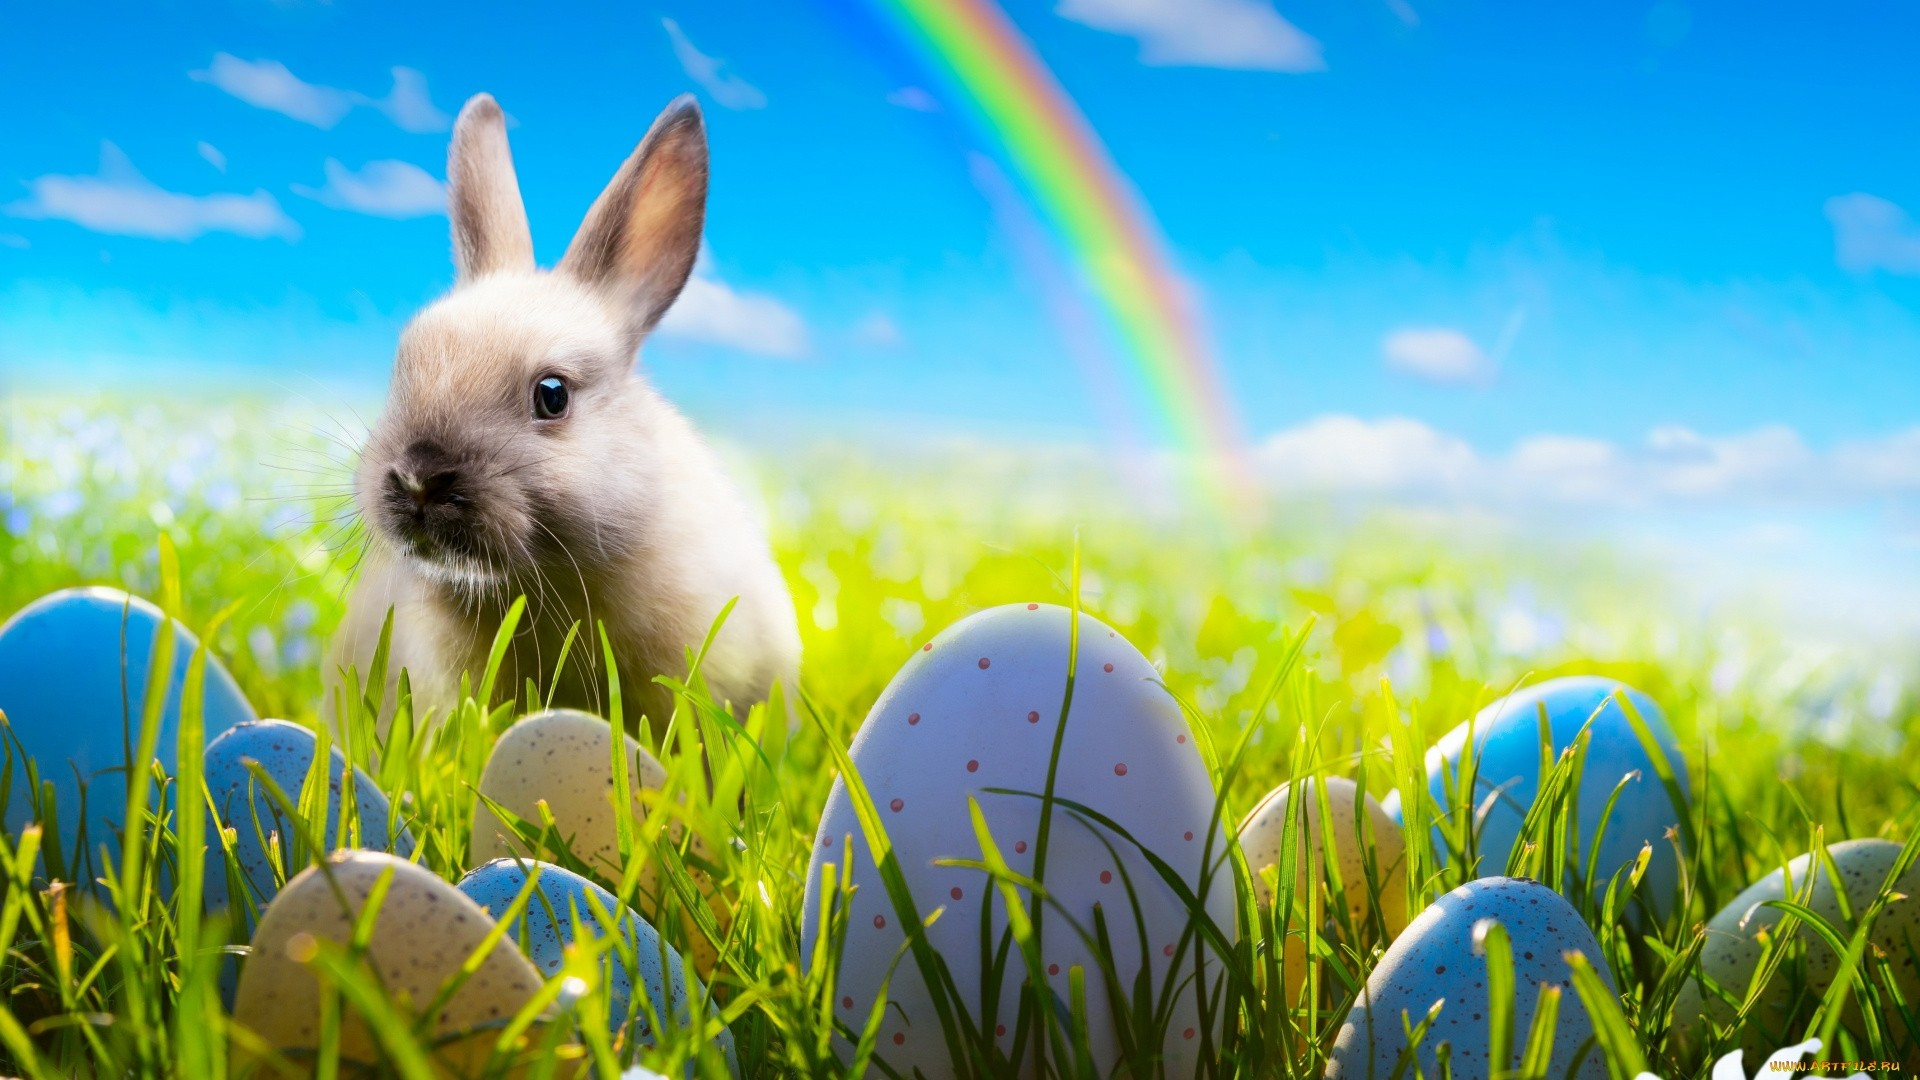 Cute Easter Wallpaper Download